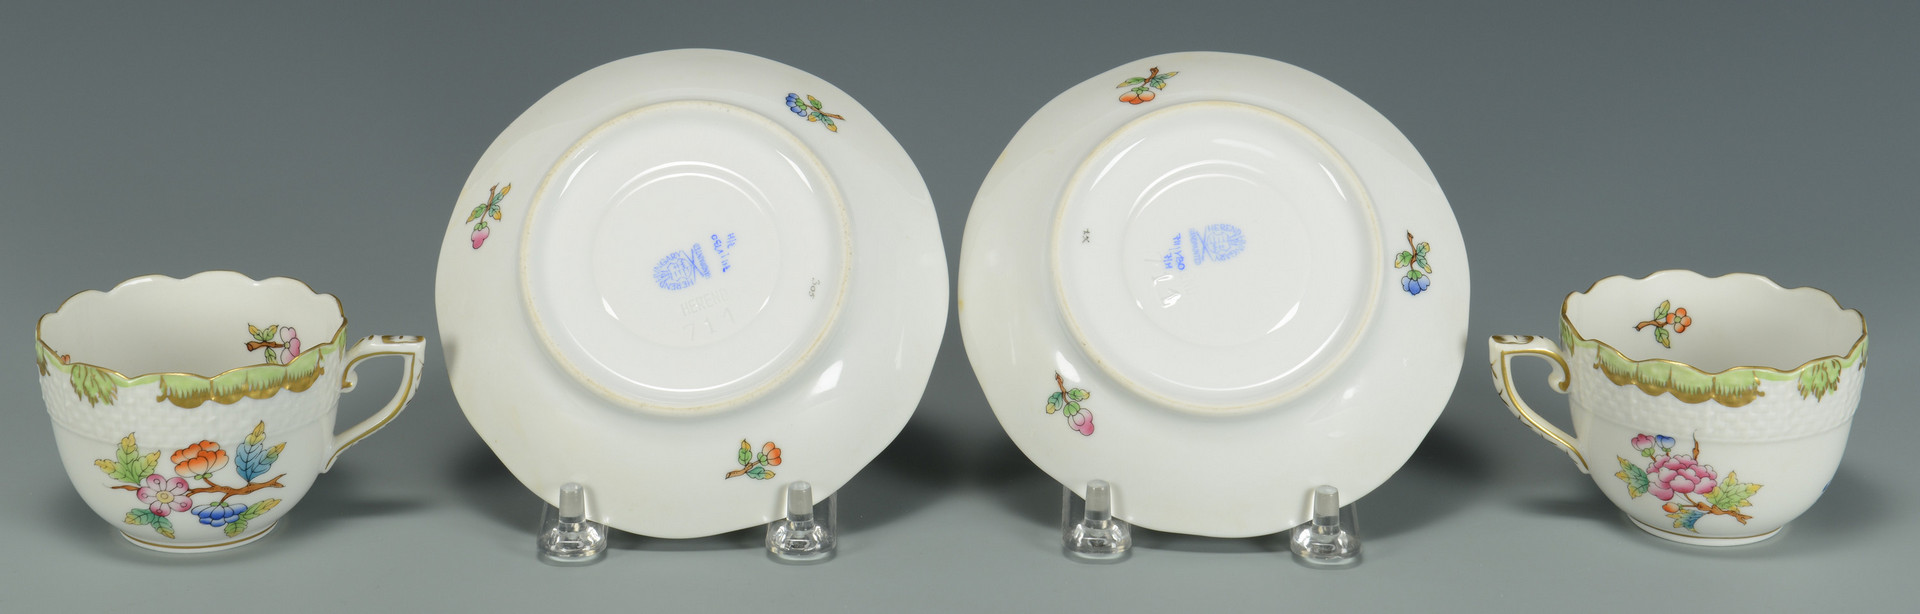 Lot 341: 9 pcs Herend Porcelain inc. Queen Victoria